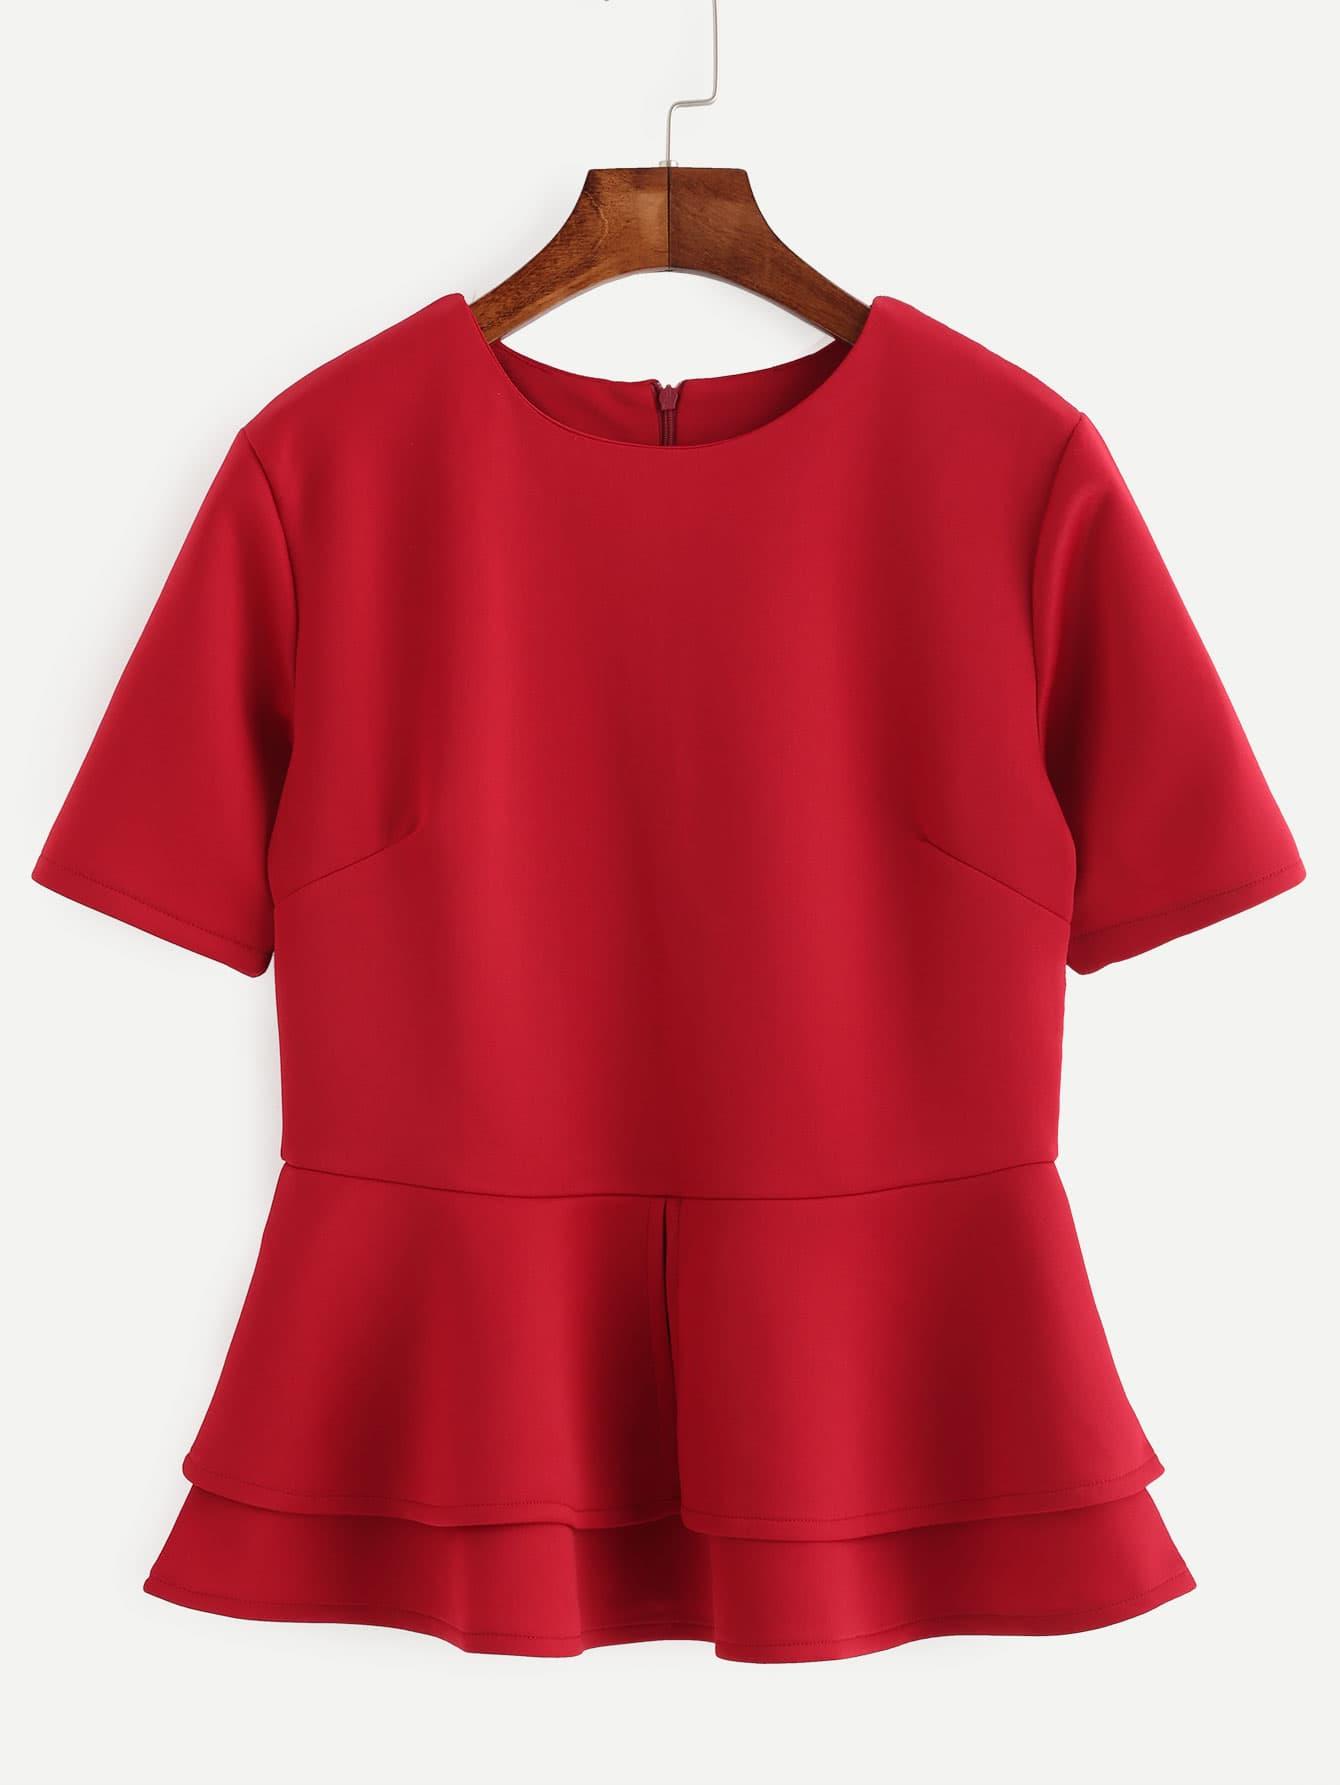 Red Zip Back Layered Peplum Top blouse160720014